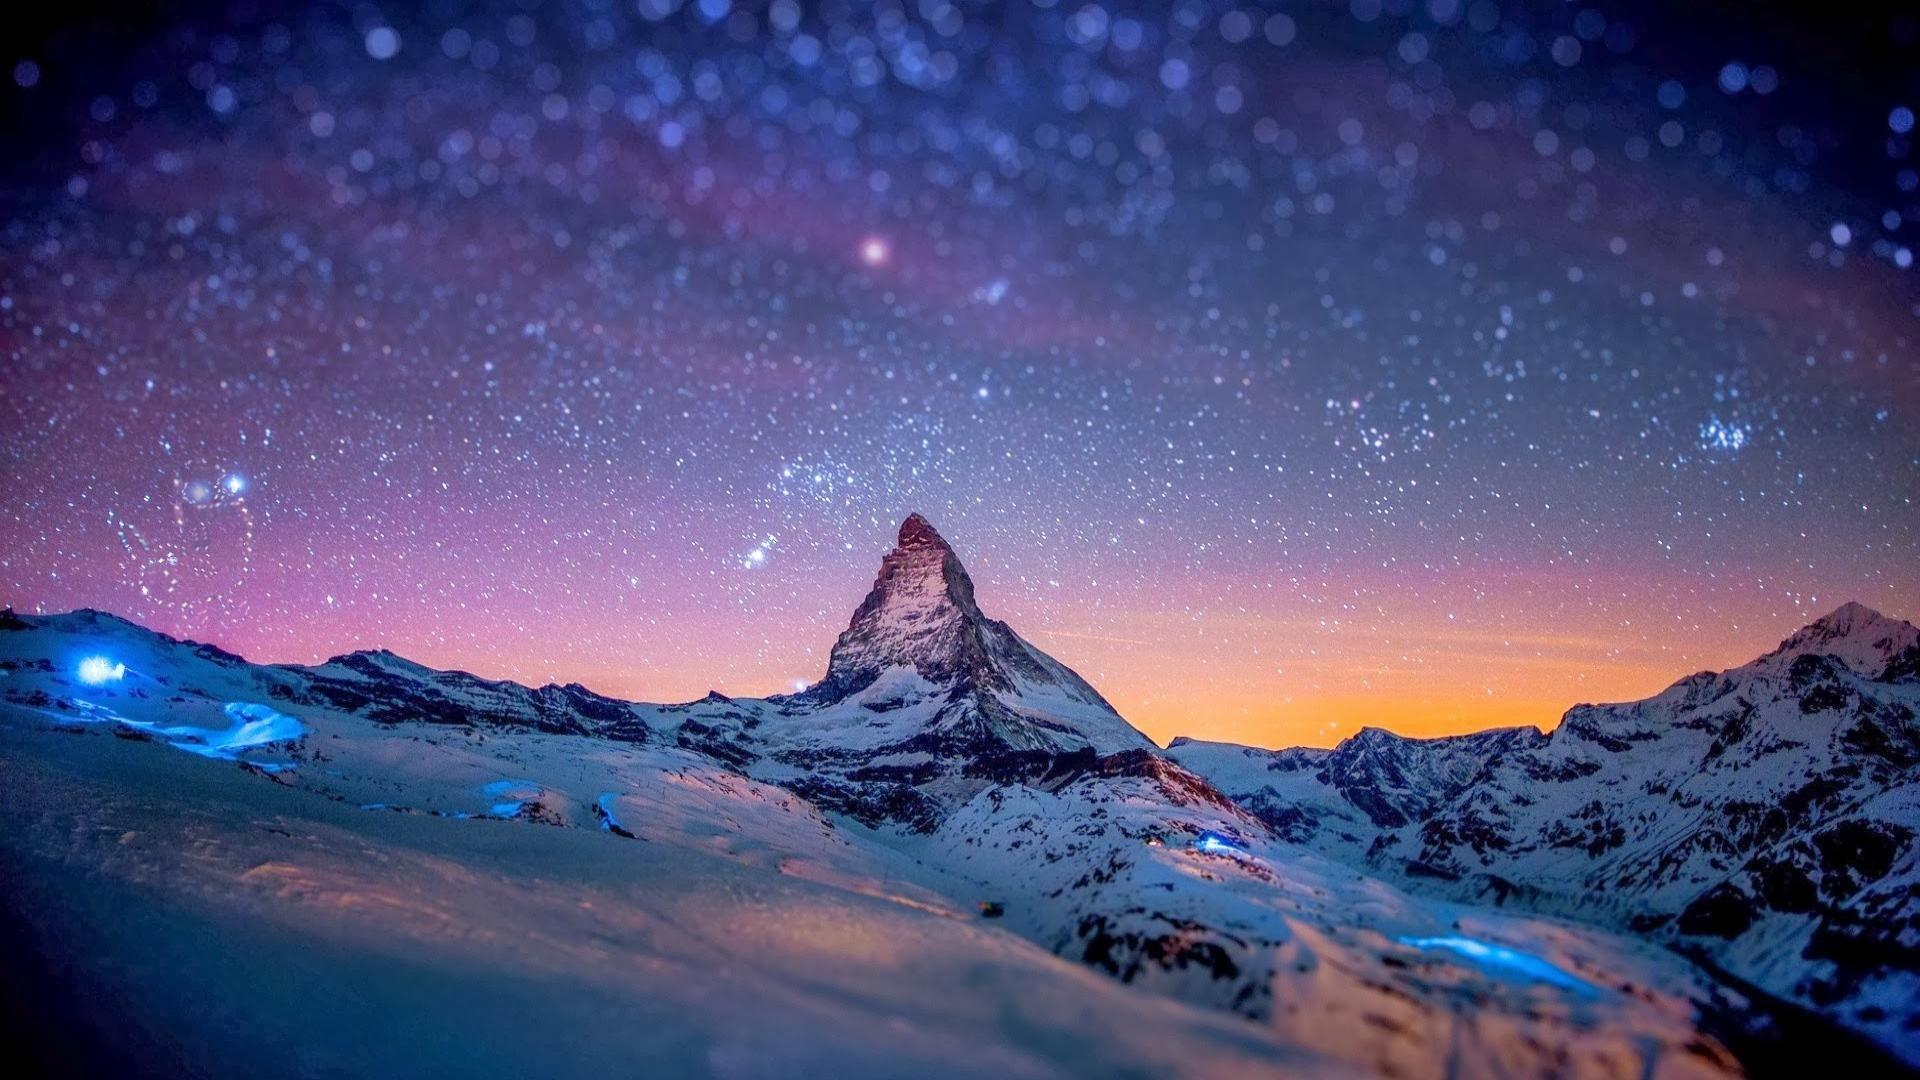 Sfondi belli 74 immagini for Paesaggi bellissimi per desktop